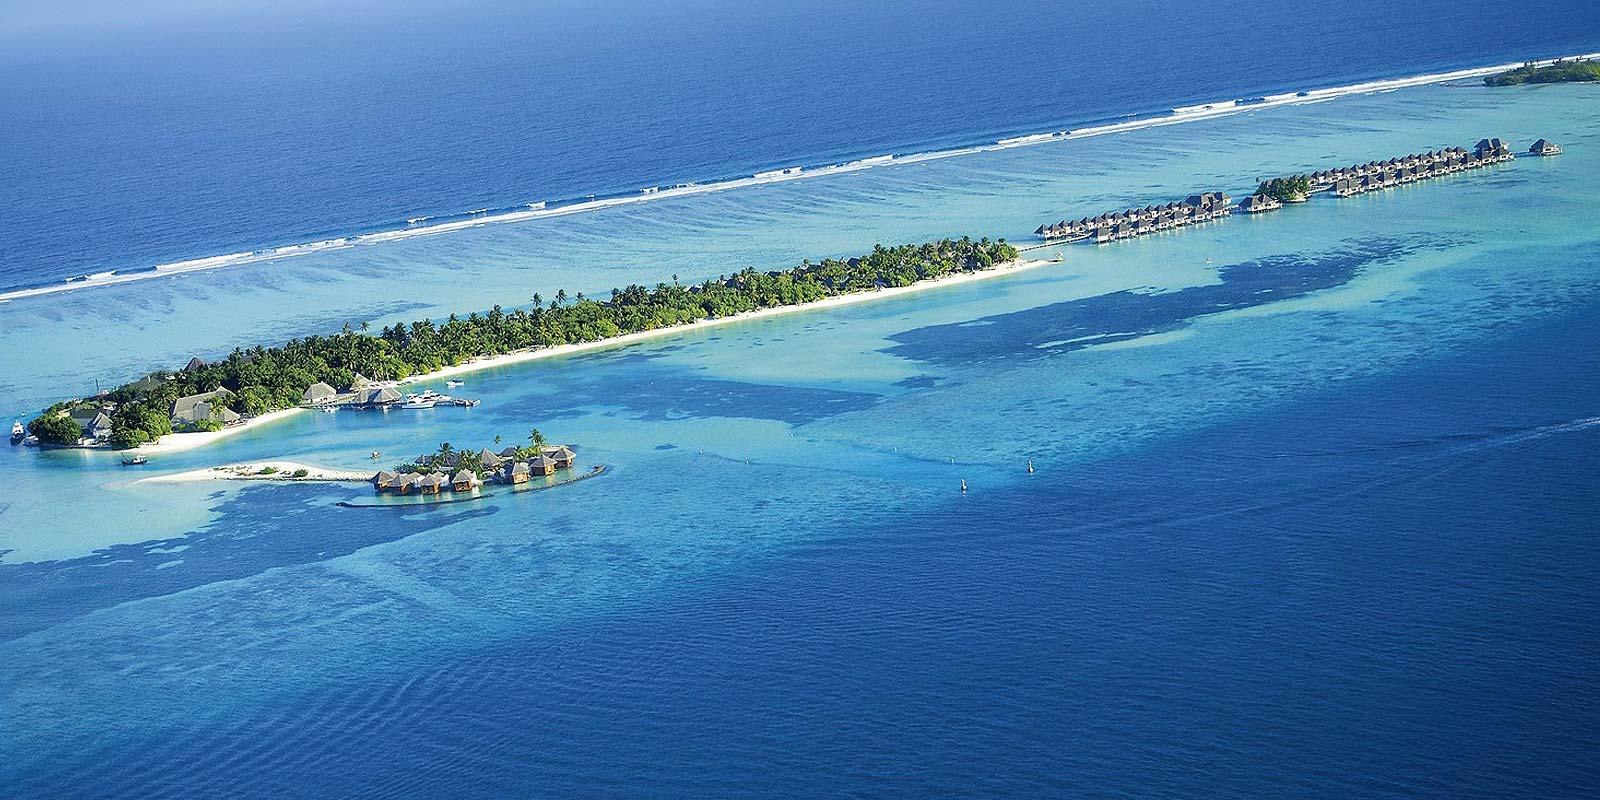 Four Seasons Maldives Top Luxusreisen De